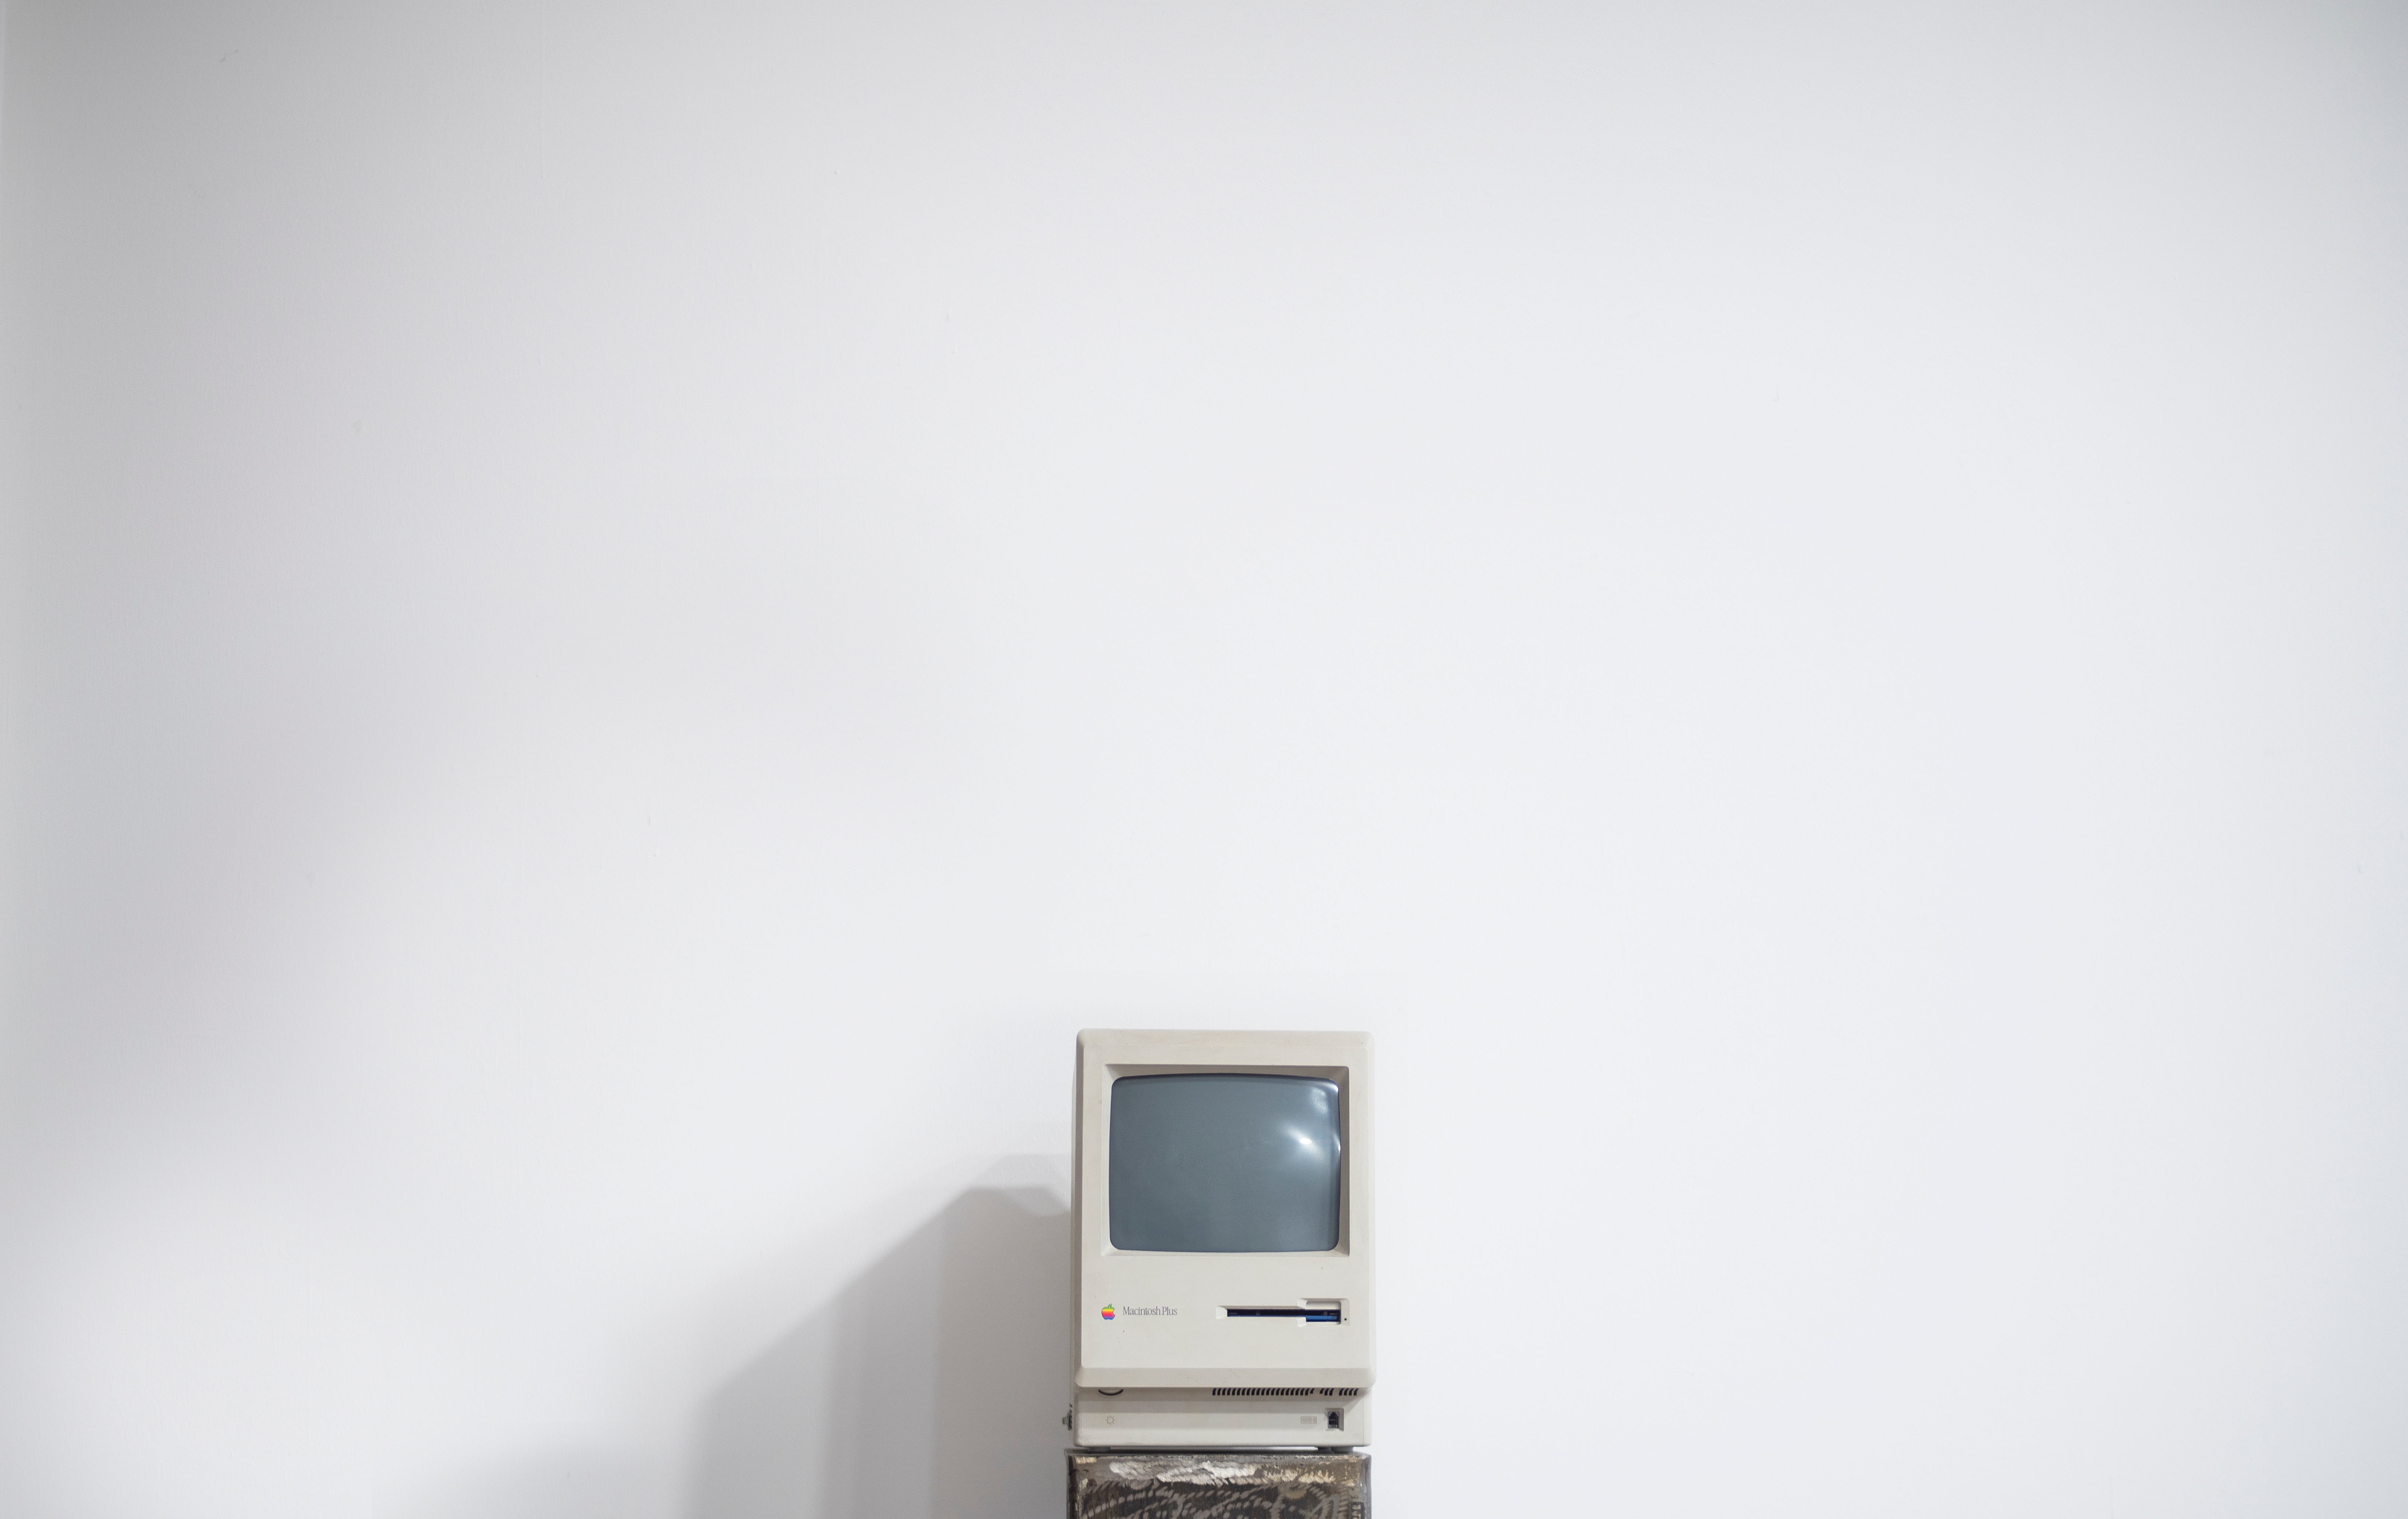 5419995 6532x4120 tecnology computer simmetry minimal 6532x4120